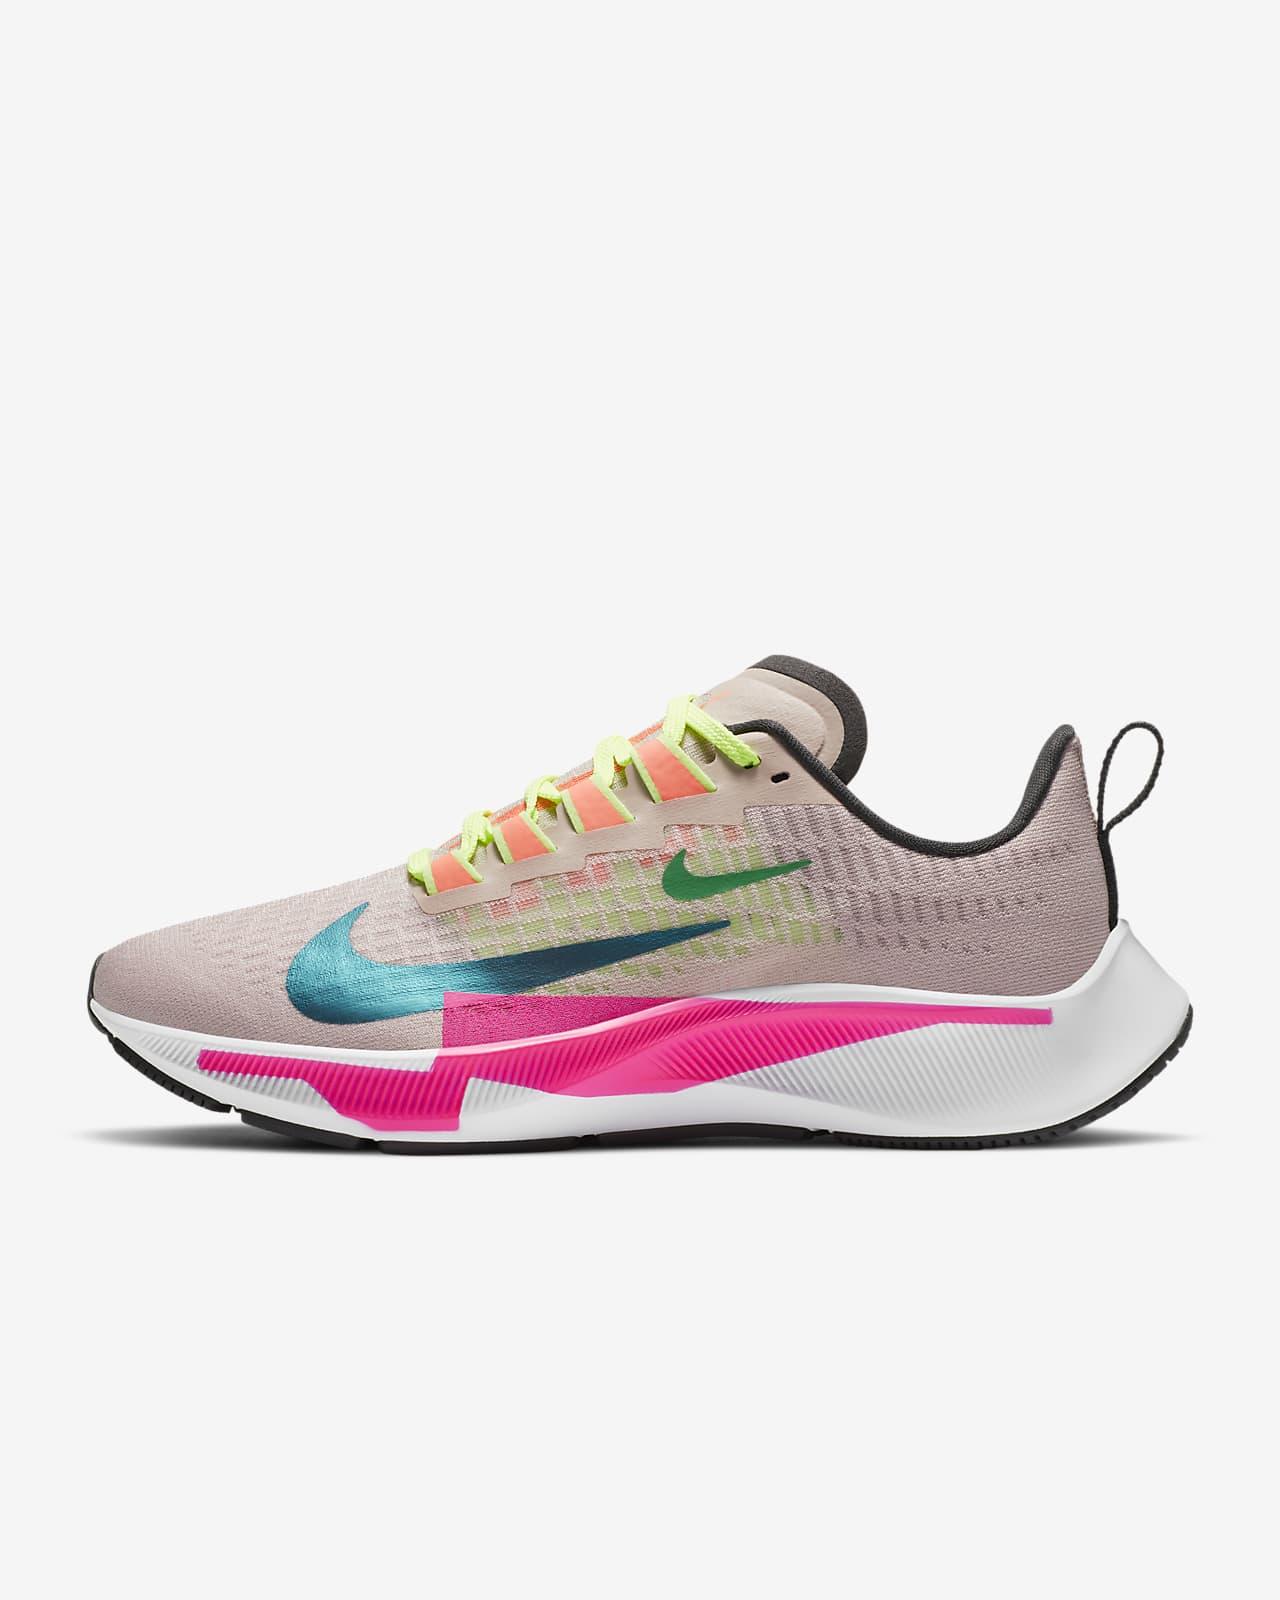 Chaussure de running Nike Air Zoom Pegasus 37 Premium pour Femme